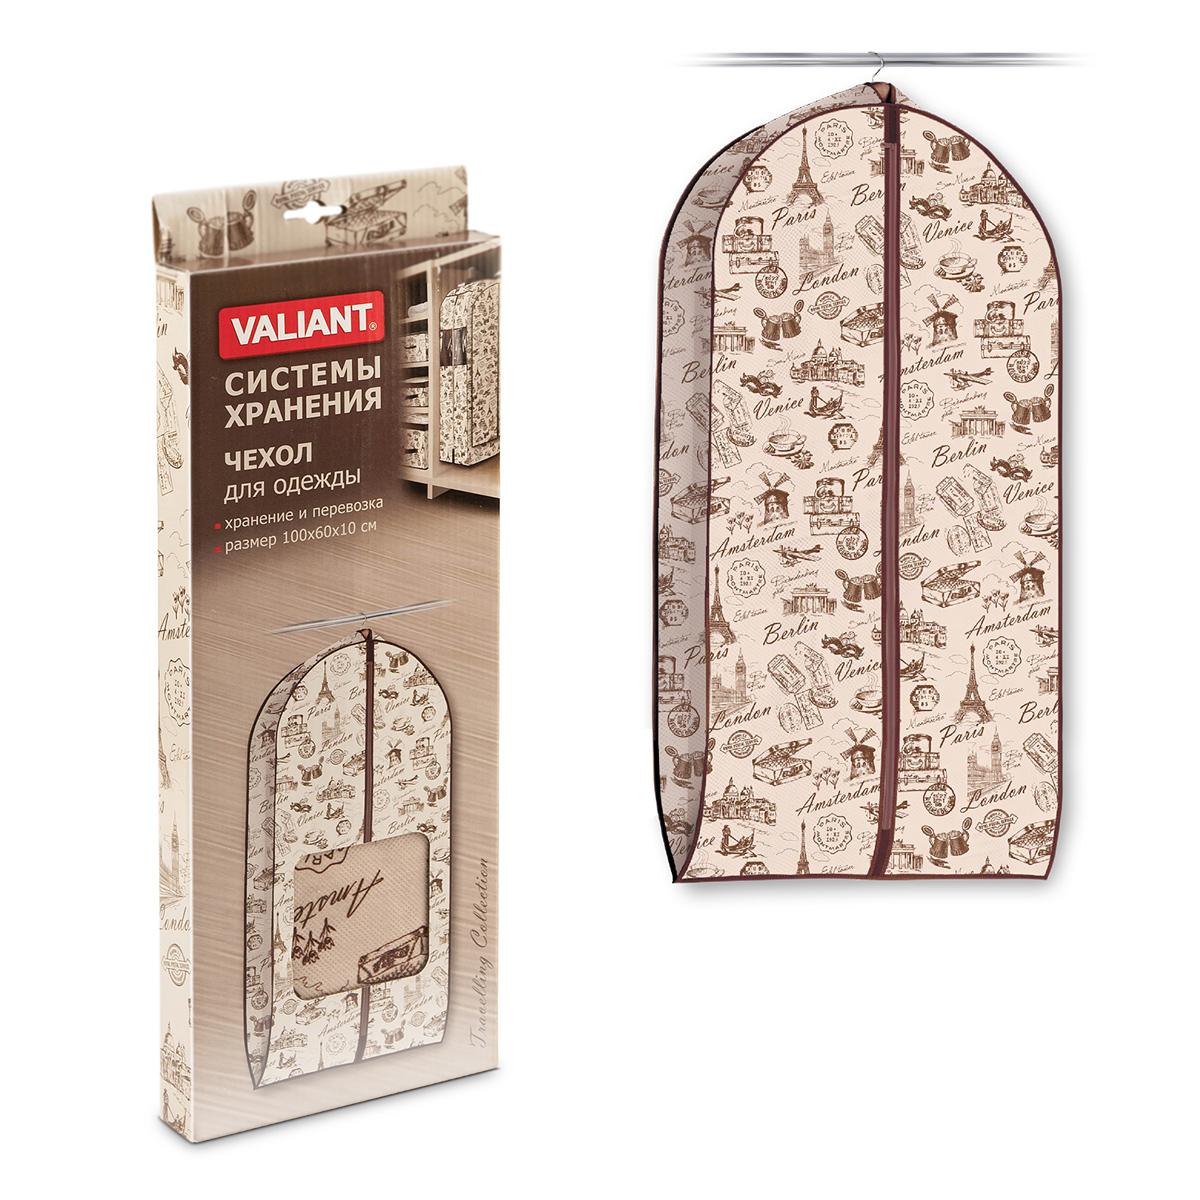 Чехол для одежды Valiant Travelling, объемный, 60 см х 100 см х 10 см чехол для одежды valiant classic объемный 60 х 100 х 10 см